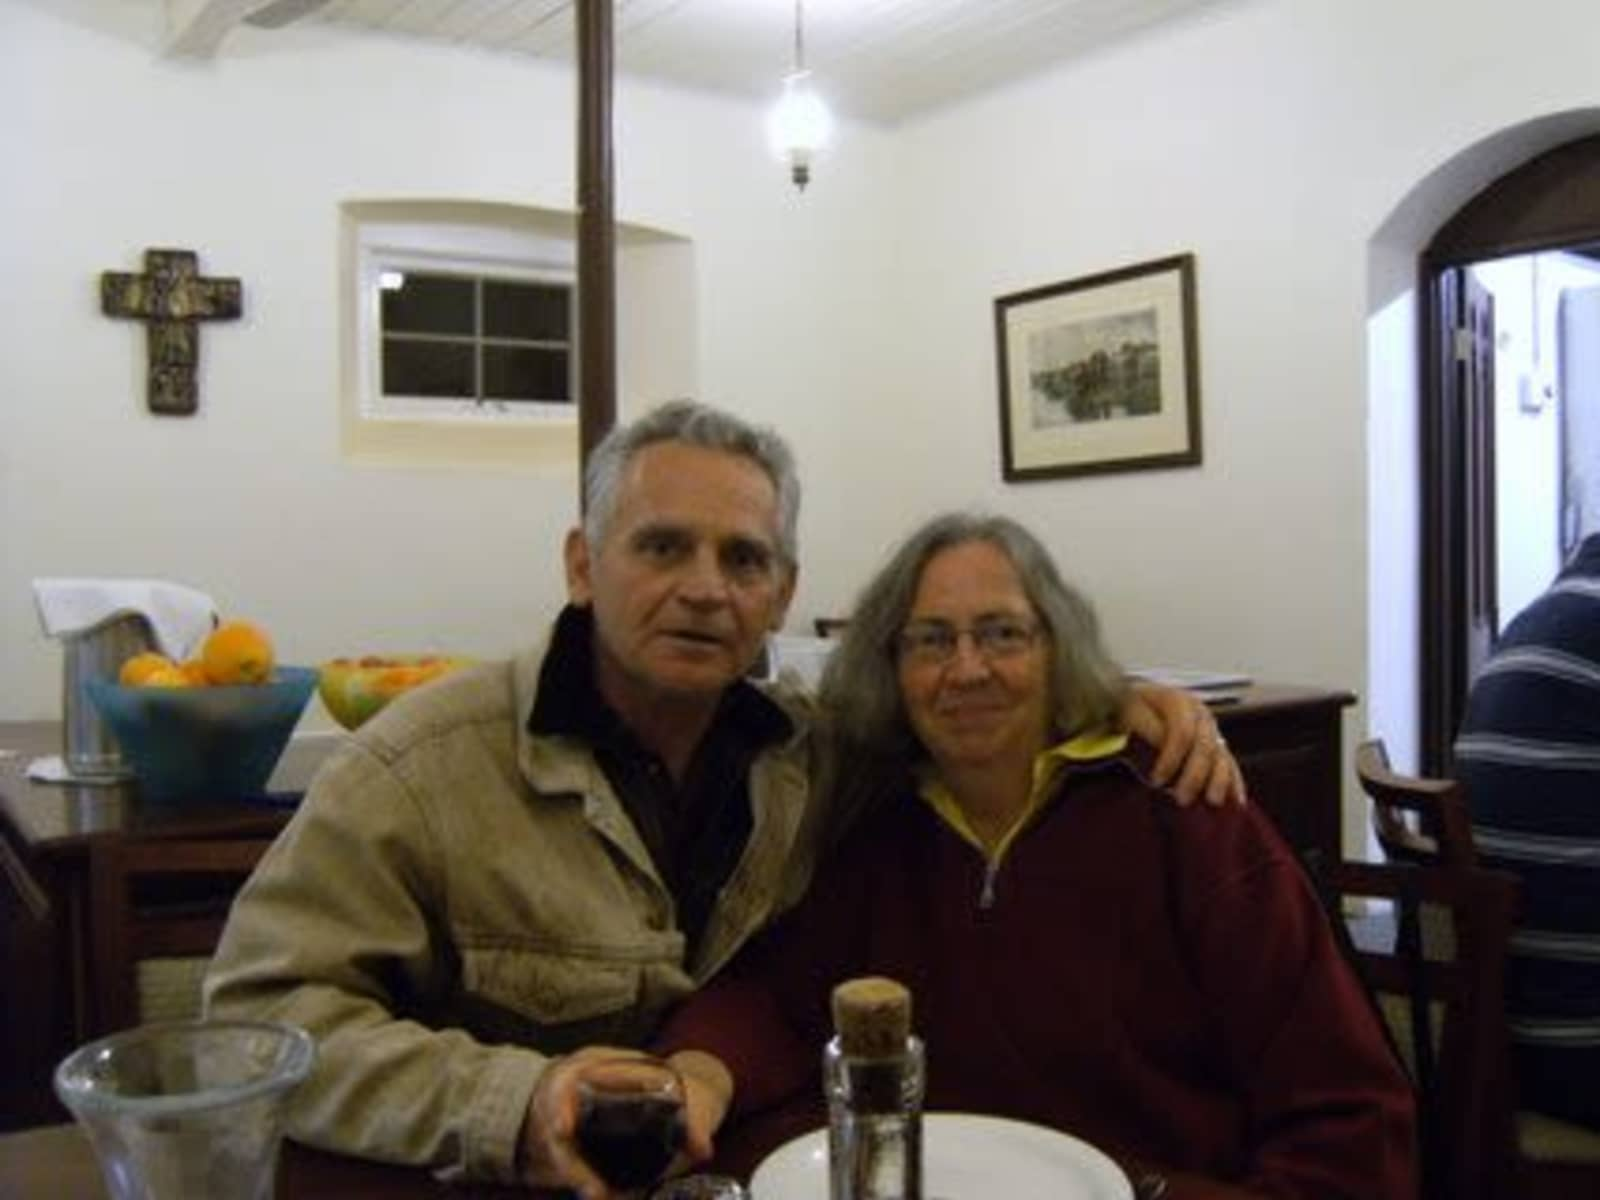 Nadir & Angela from Scone, New South Wales, Australia